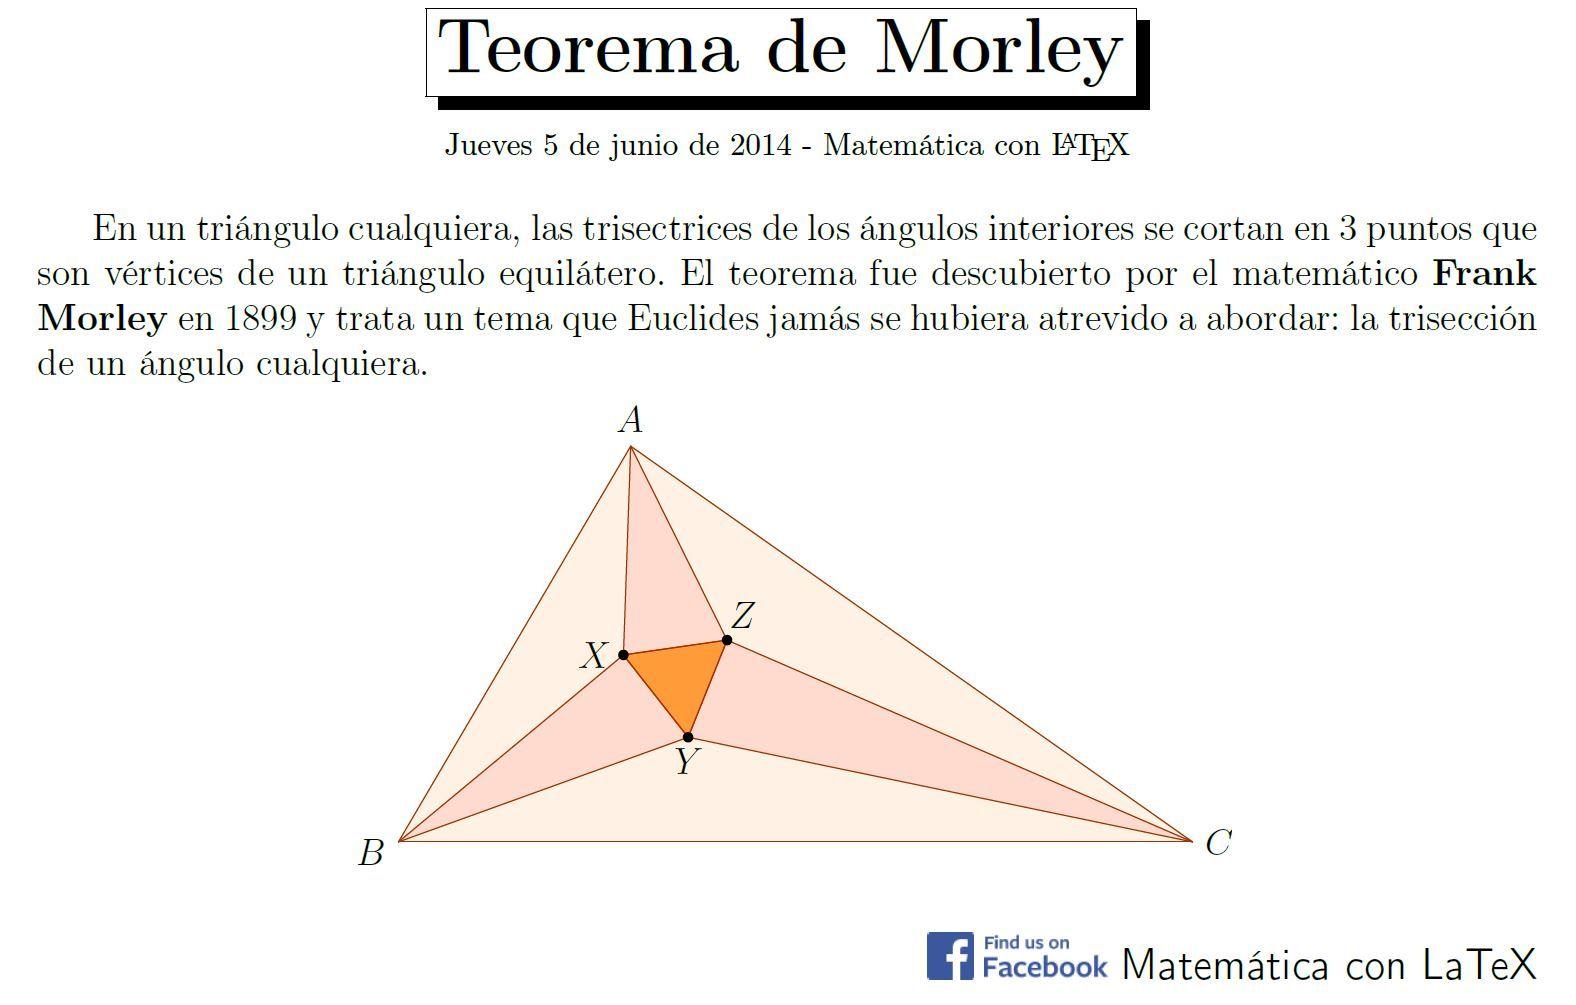 Morley S Theorem Http Www Facebook Com Matematicaconlatex Matematik